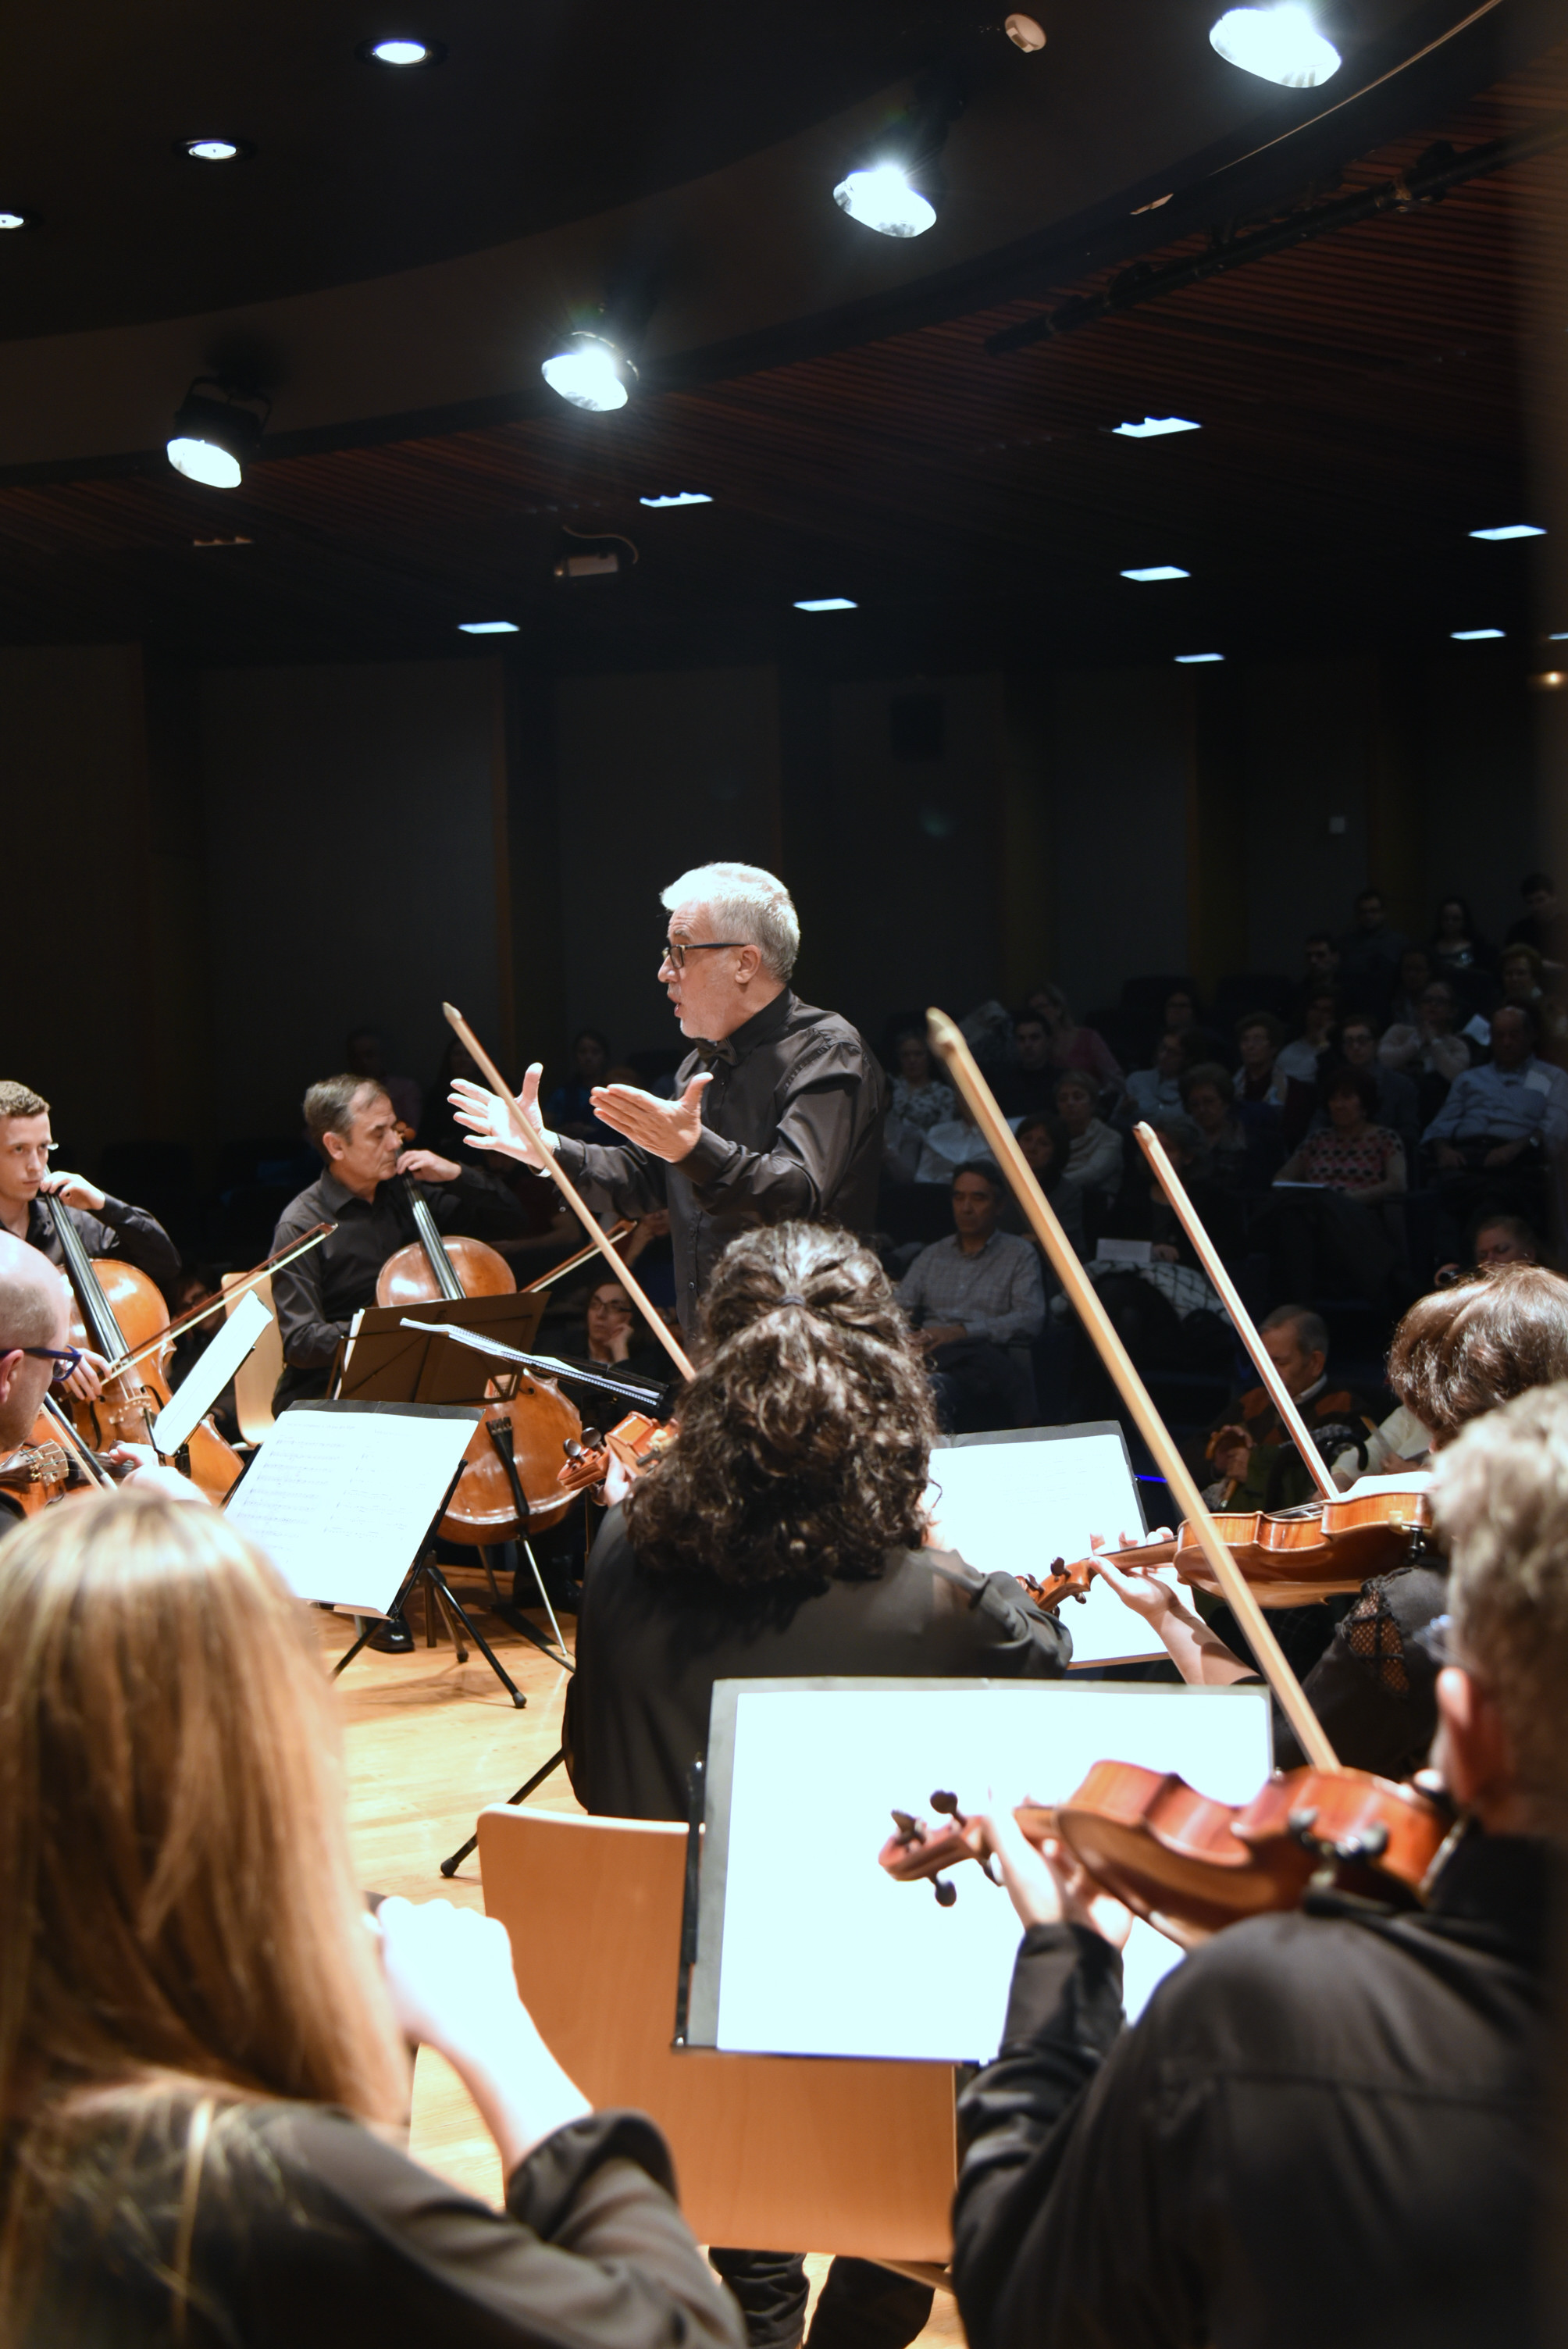 http://orquestatutti.com/wp/wp-content/uploads/2017/02/DSC_9698.jpg